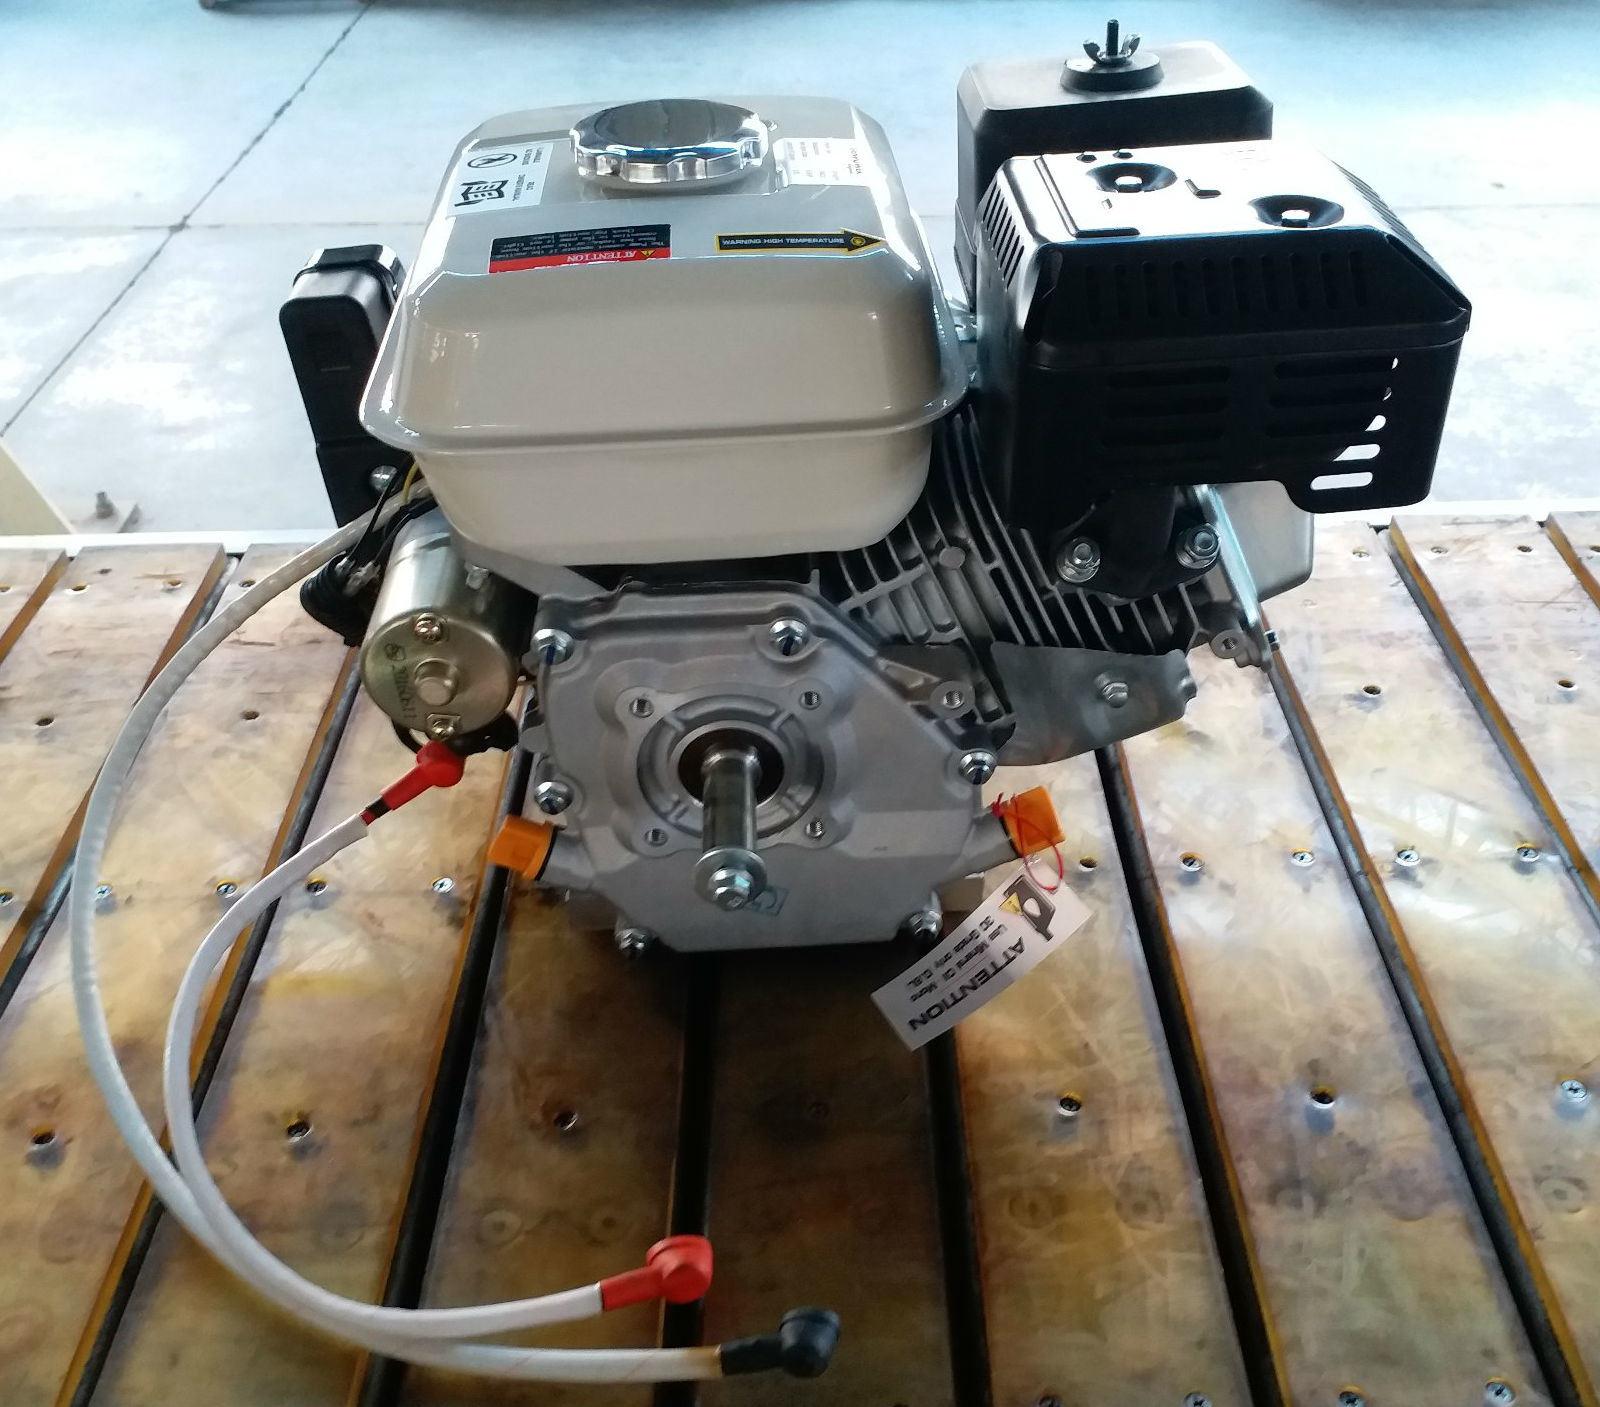 196cc/6.5HP 1/2 Reduction Gasoline Engine (Output shaft - 3/4 inch (19.05mm) 3/16 keyway)